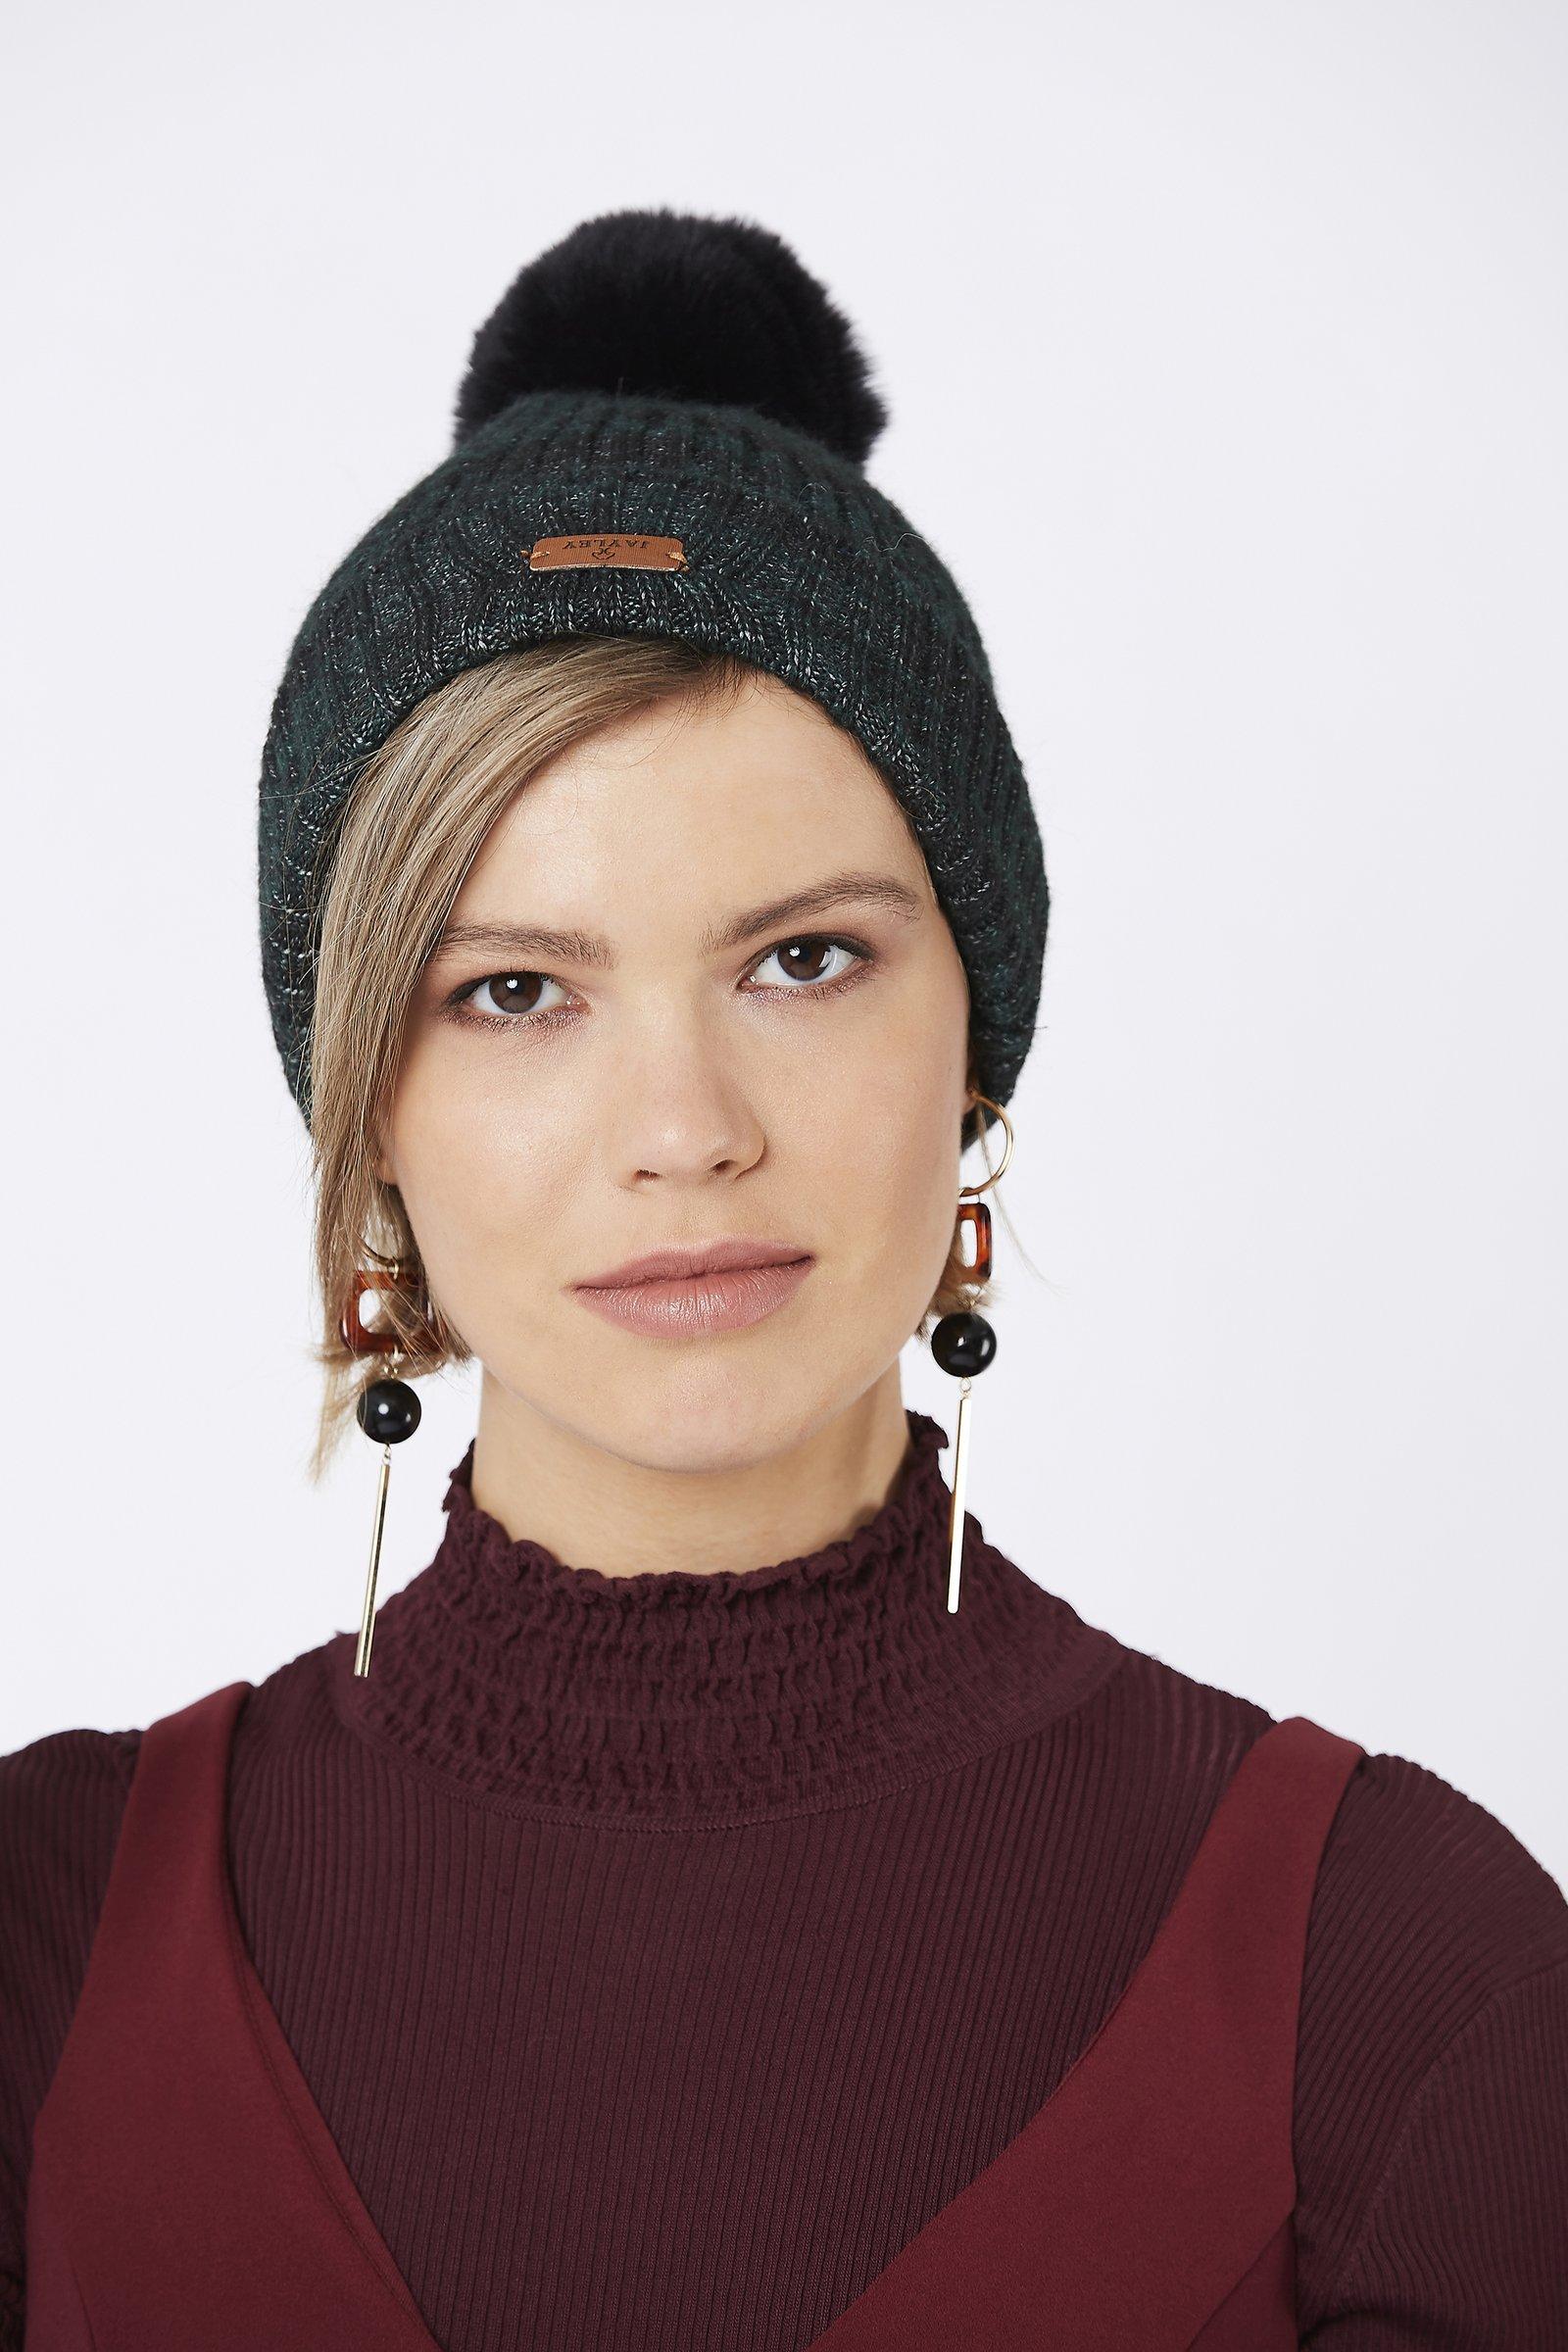 JayLey Wool and faux fur pom pom hat- dark green